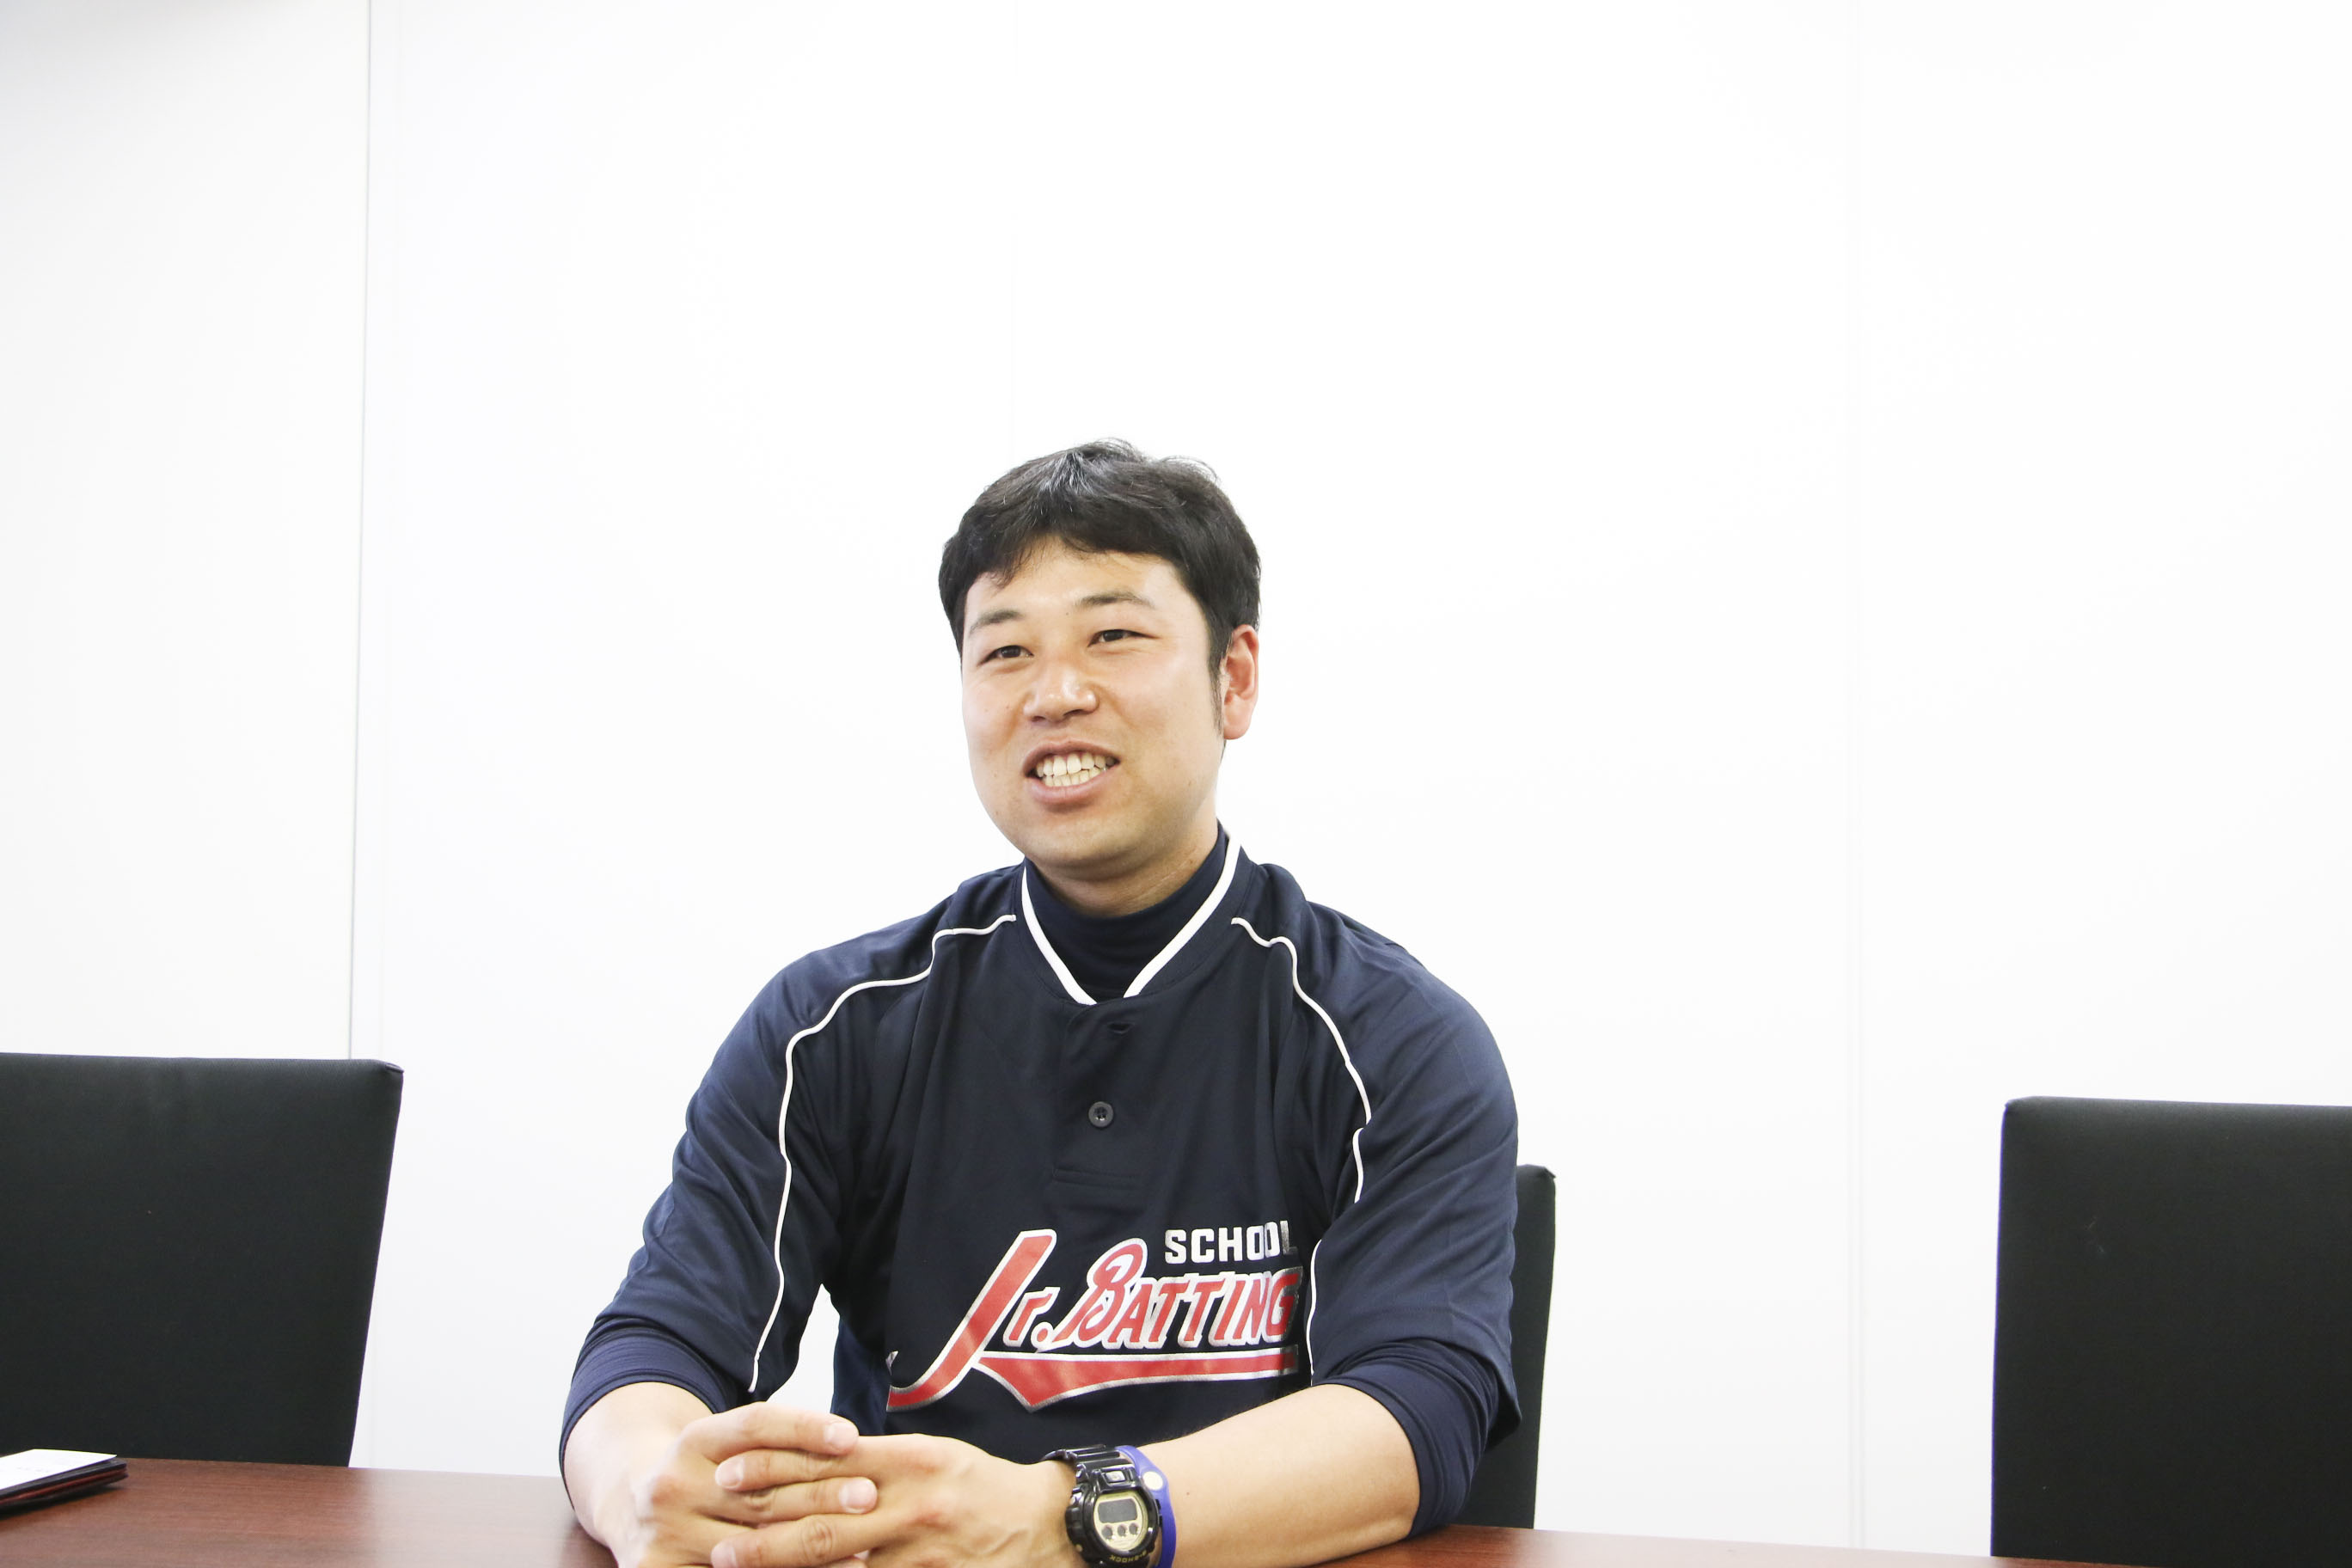 JBS武蔵というバッティングスクールの代表を務める下広志さんの正面写真